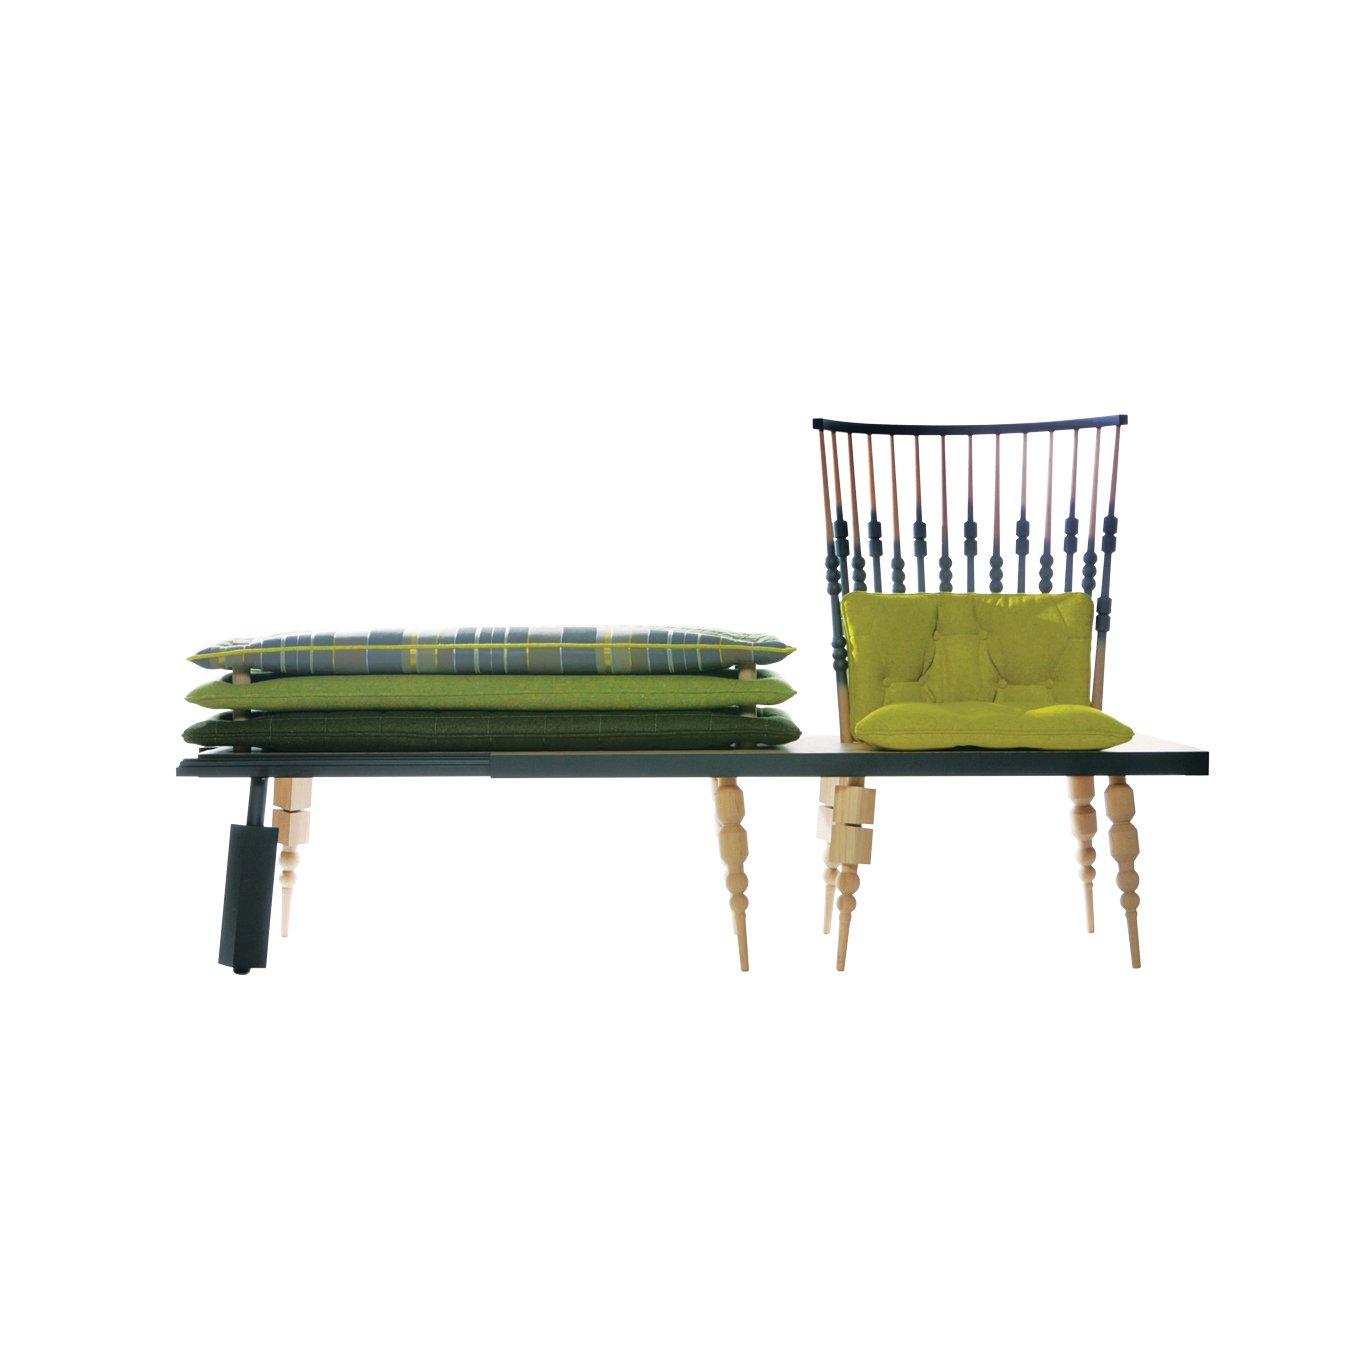 #seatingdesign #seating #chair #bench #furniture #design #WhyNotBespoke #modern #ChristopherRoy  100+ Best Modern Seating Designs